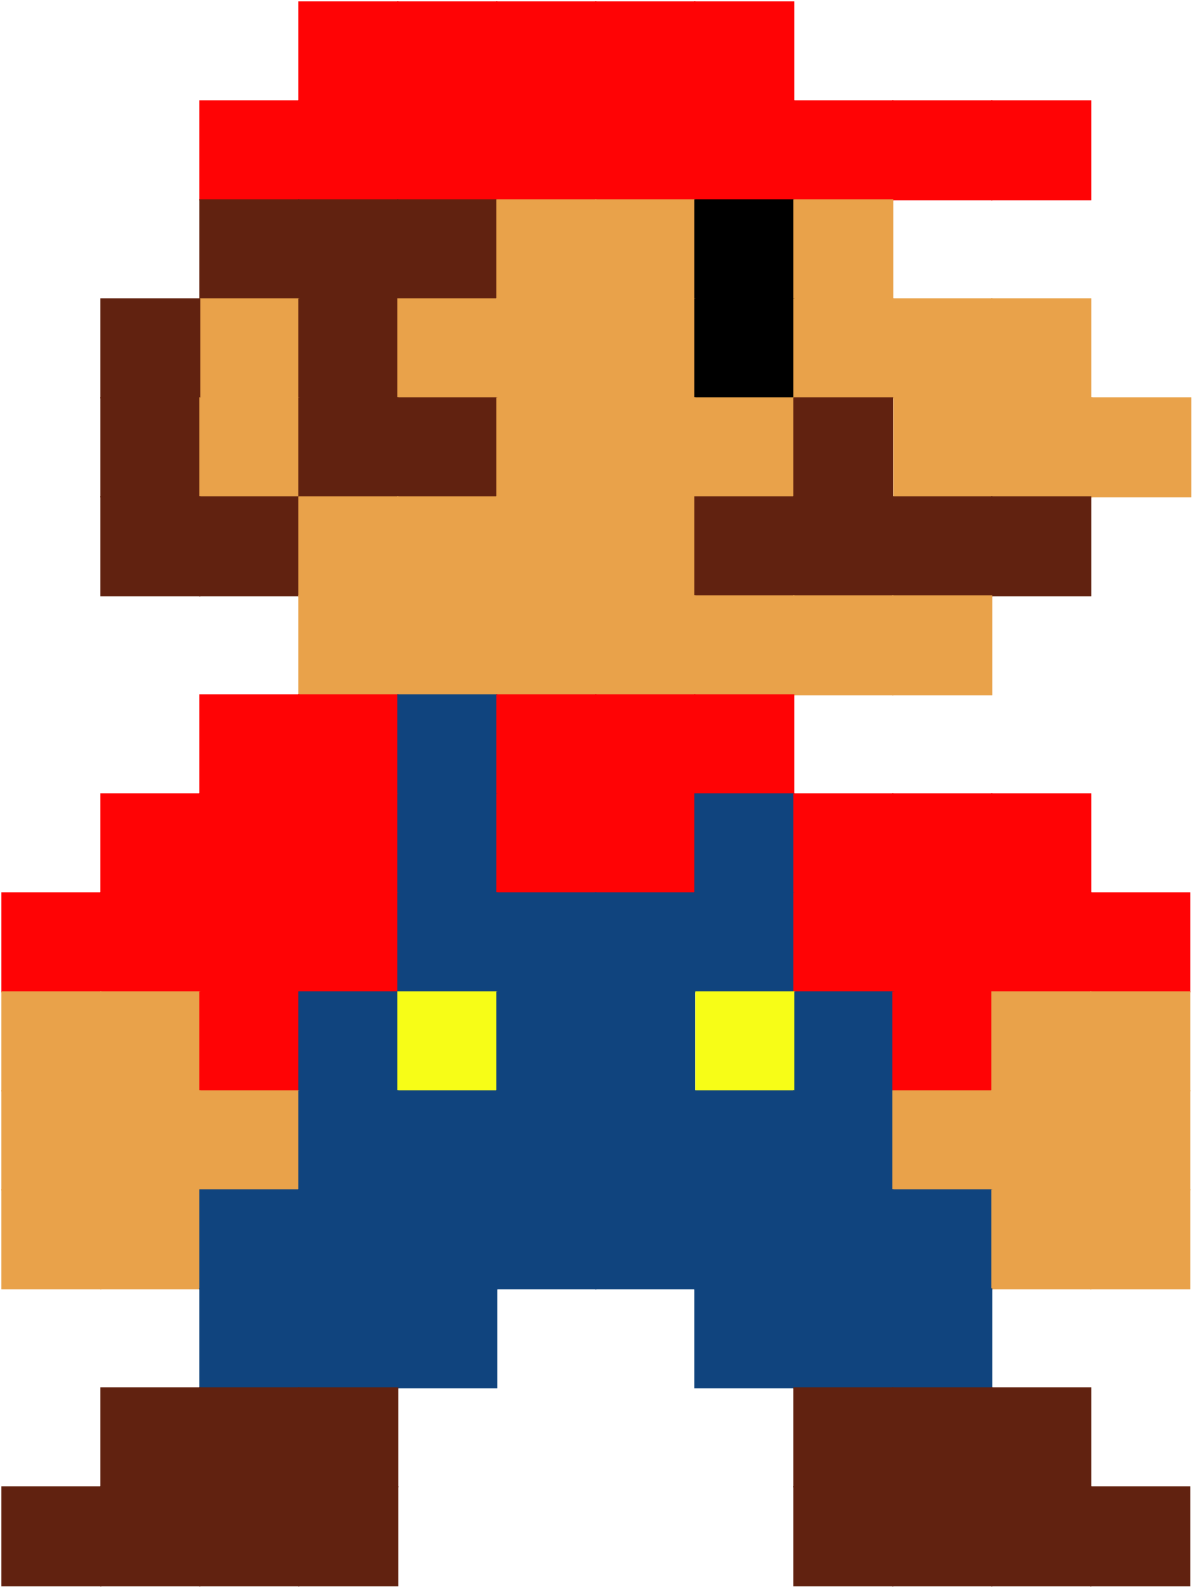 Pipe Clipart Pixel Art Super Mario Bros Pixel